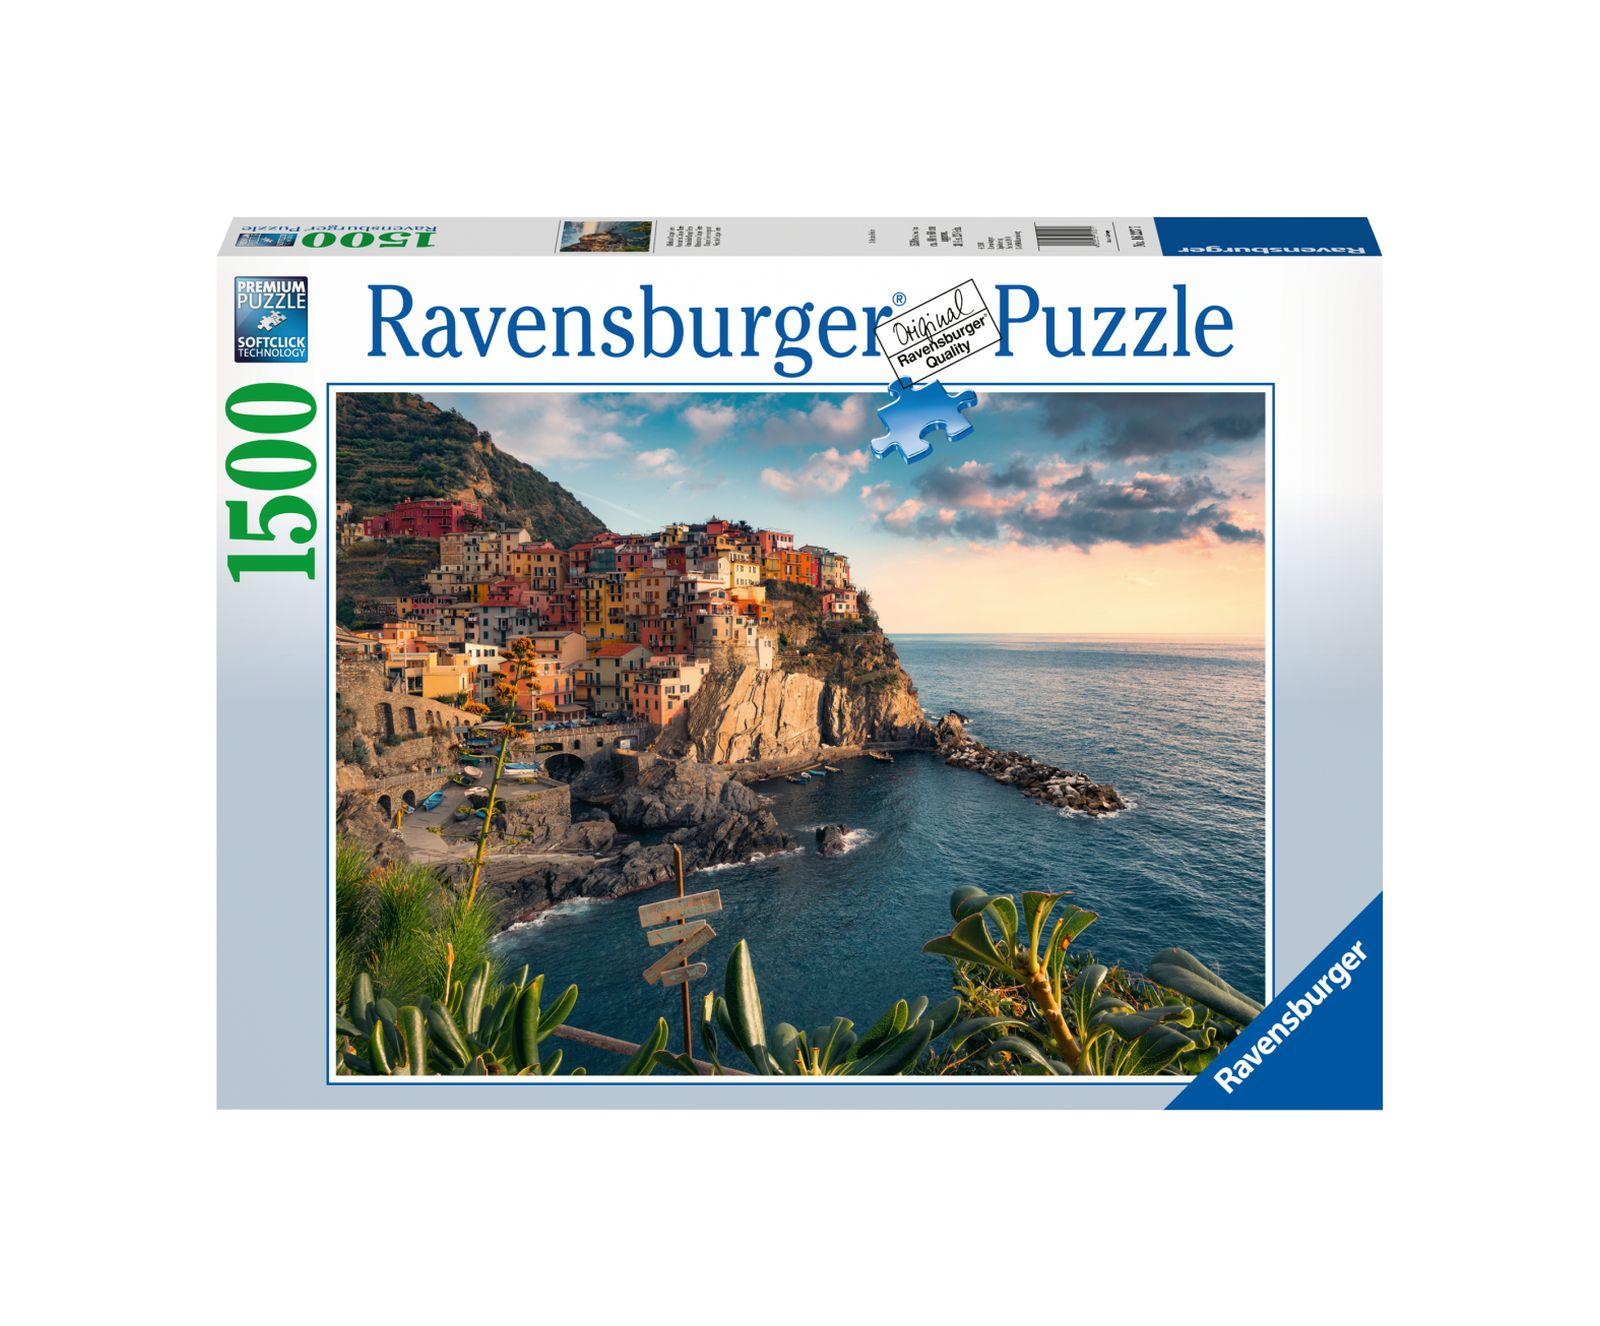 Ravensburger puzzle 1500 pezzi vista delle cinque terre - Ravensburger1